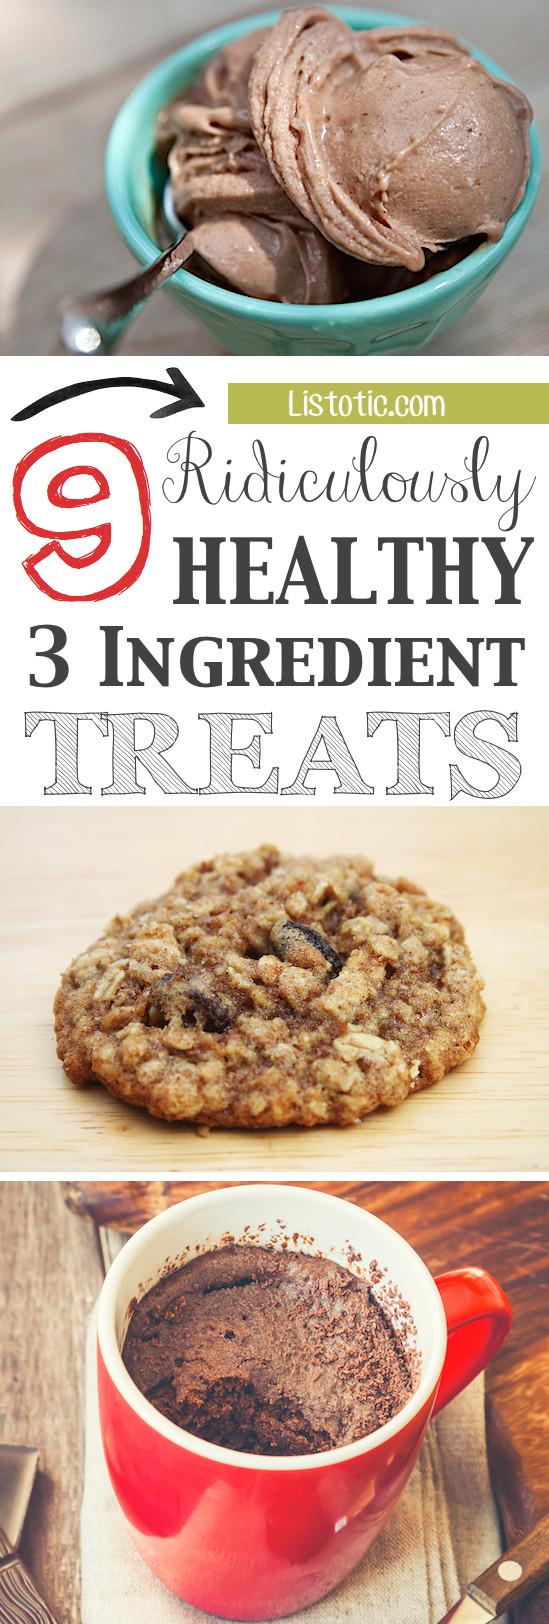 Ridiculously Healthy Banana Oatmeal Cookies Recipe  ridiculously healthy banana oatmeal cookies recipe